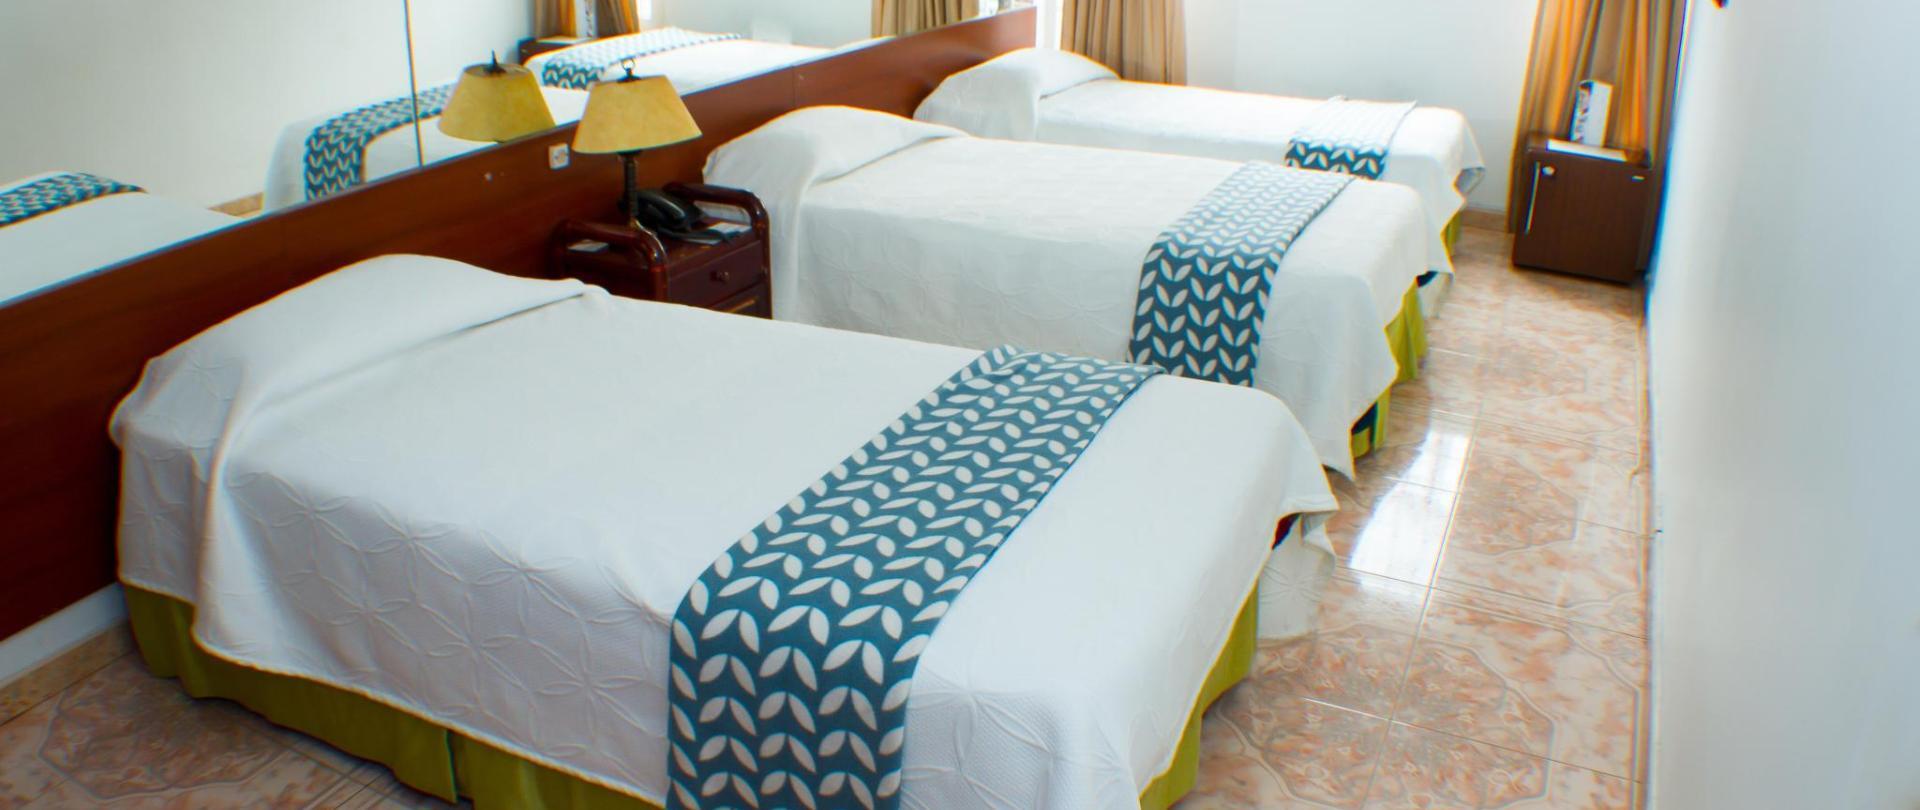 Hotel_Siar-8865.jpg